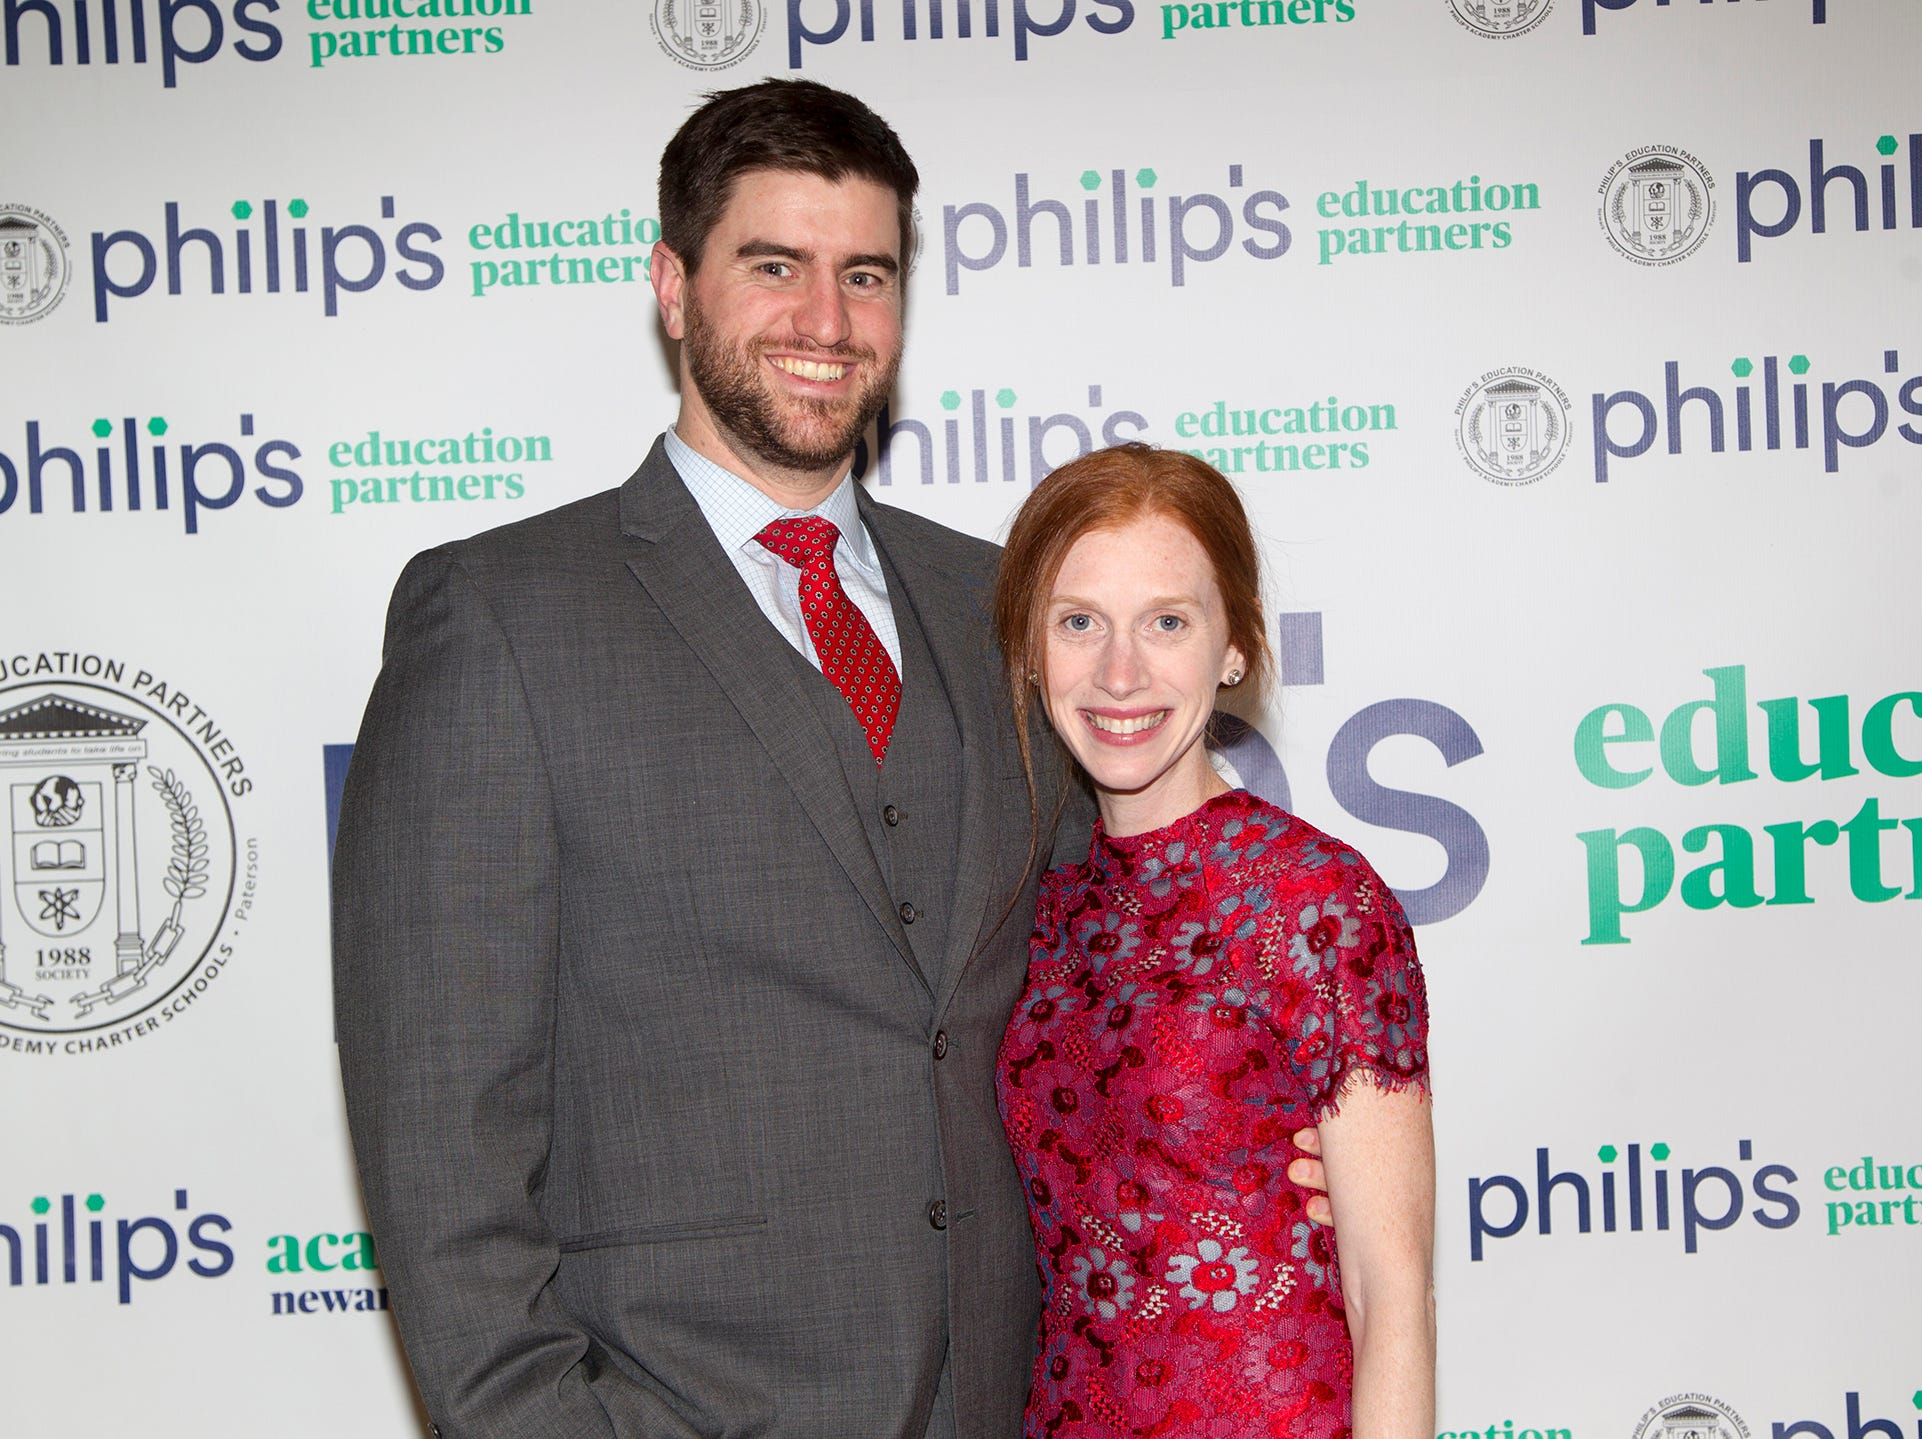 Matthew Mierswa, Regina Lauricella. Philip's Education Partners host The Dream Maker 30th anniversary gala at The Mezzanine in Newark 3/29/2019.